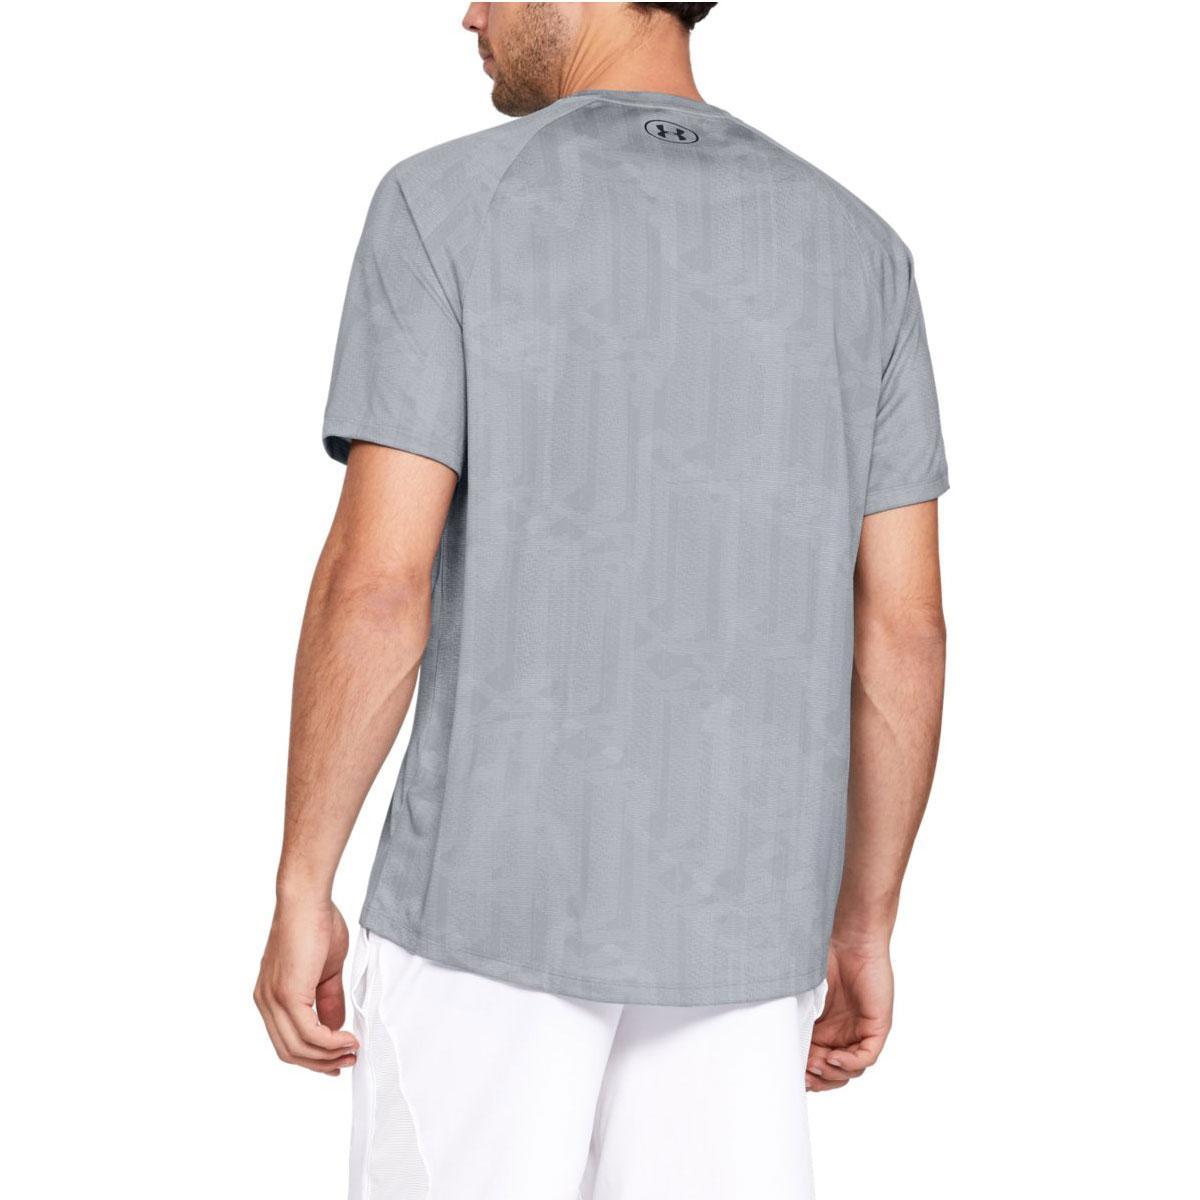 Under-Armour-Mens-UA-Tech-SS-Printed-Moisture-Wicking-T-Shirt-Tee-27-OFF-RRP thumbnail 15